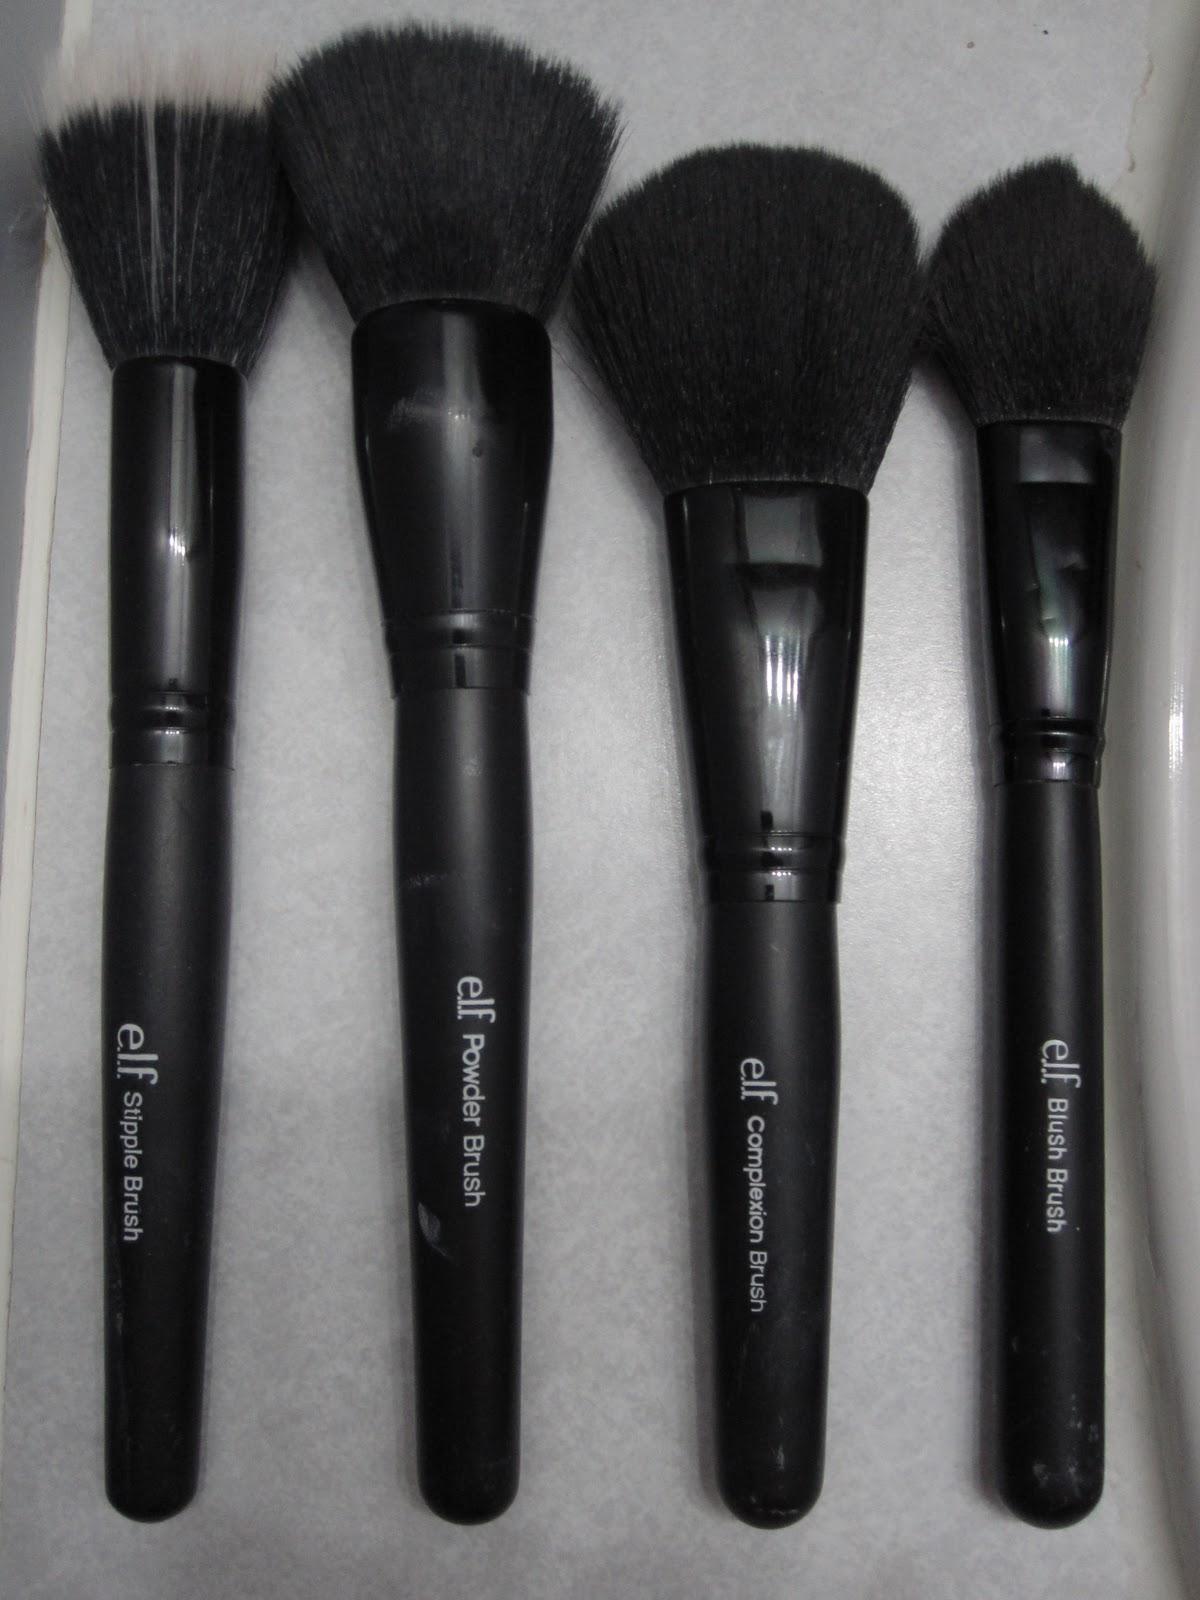 Powder Brush by e.l.f. #19